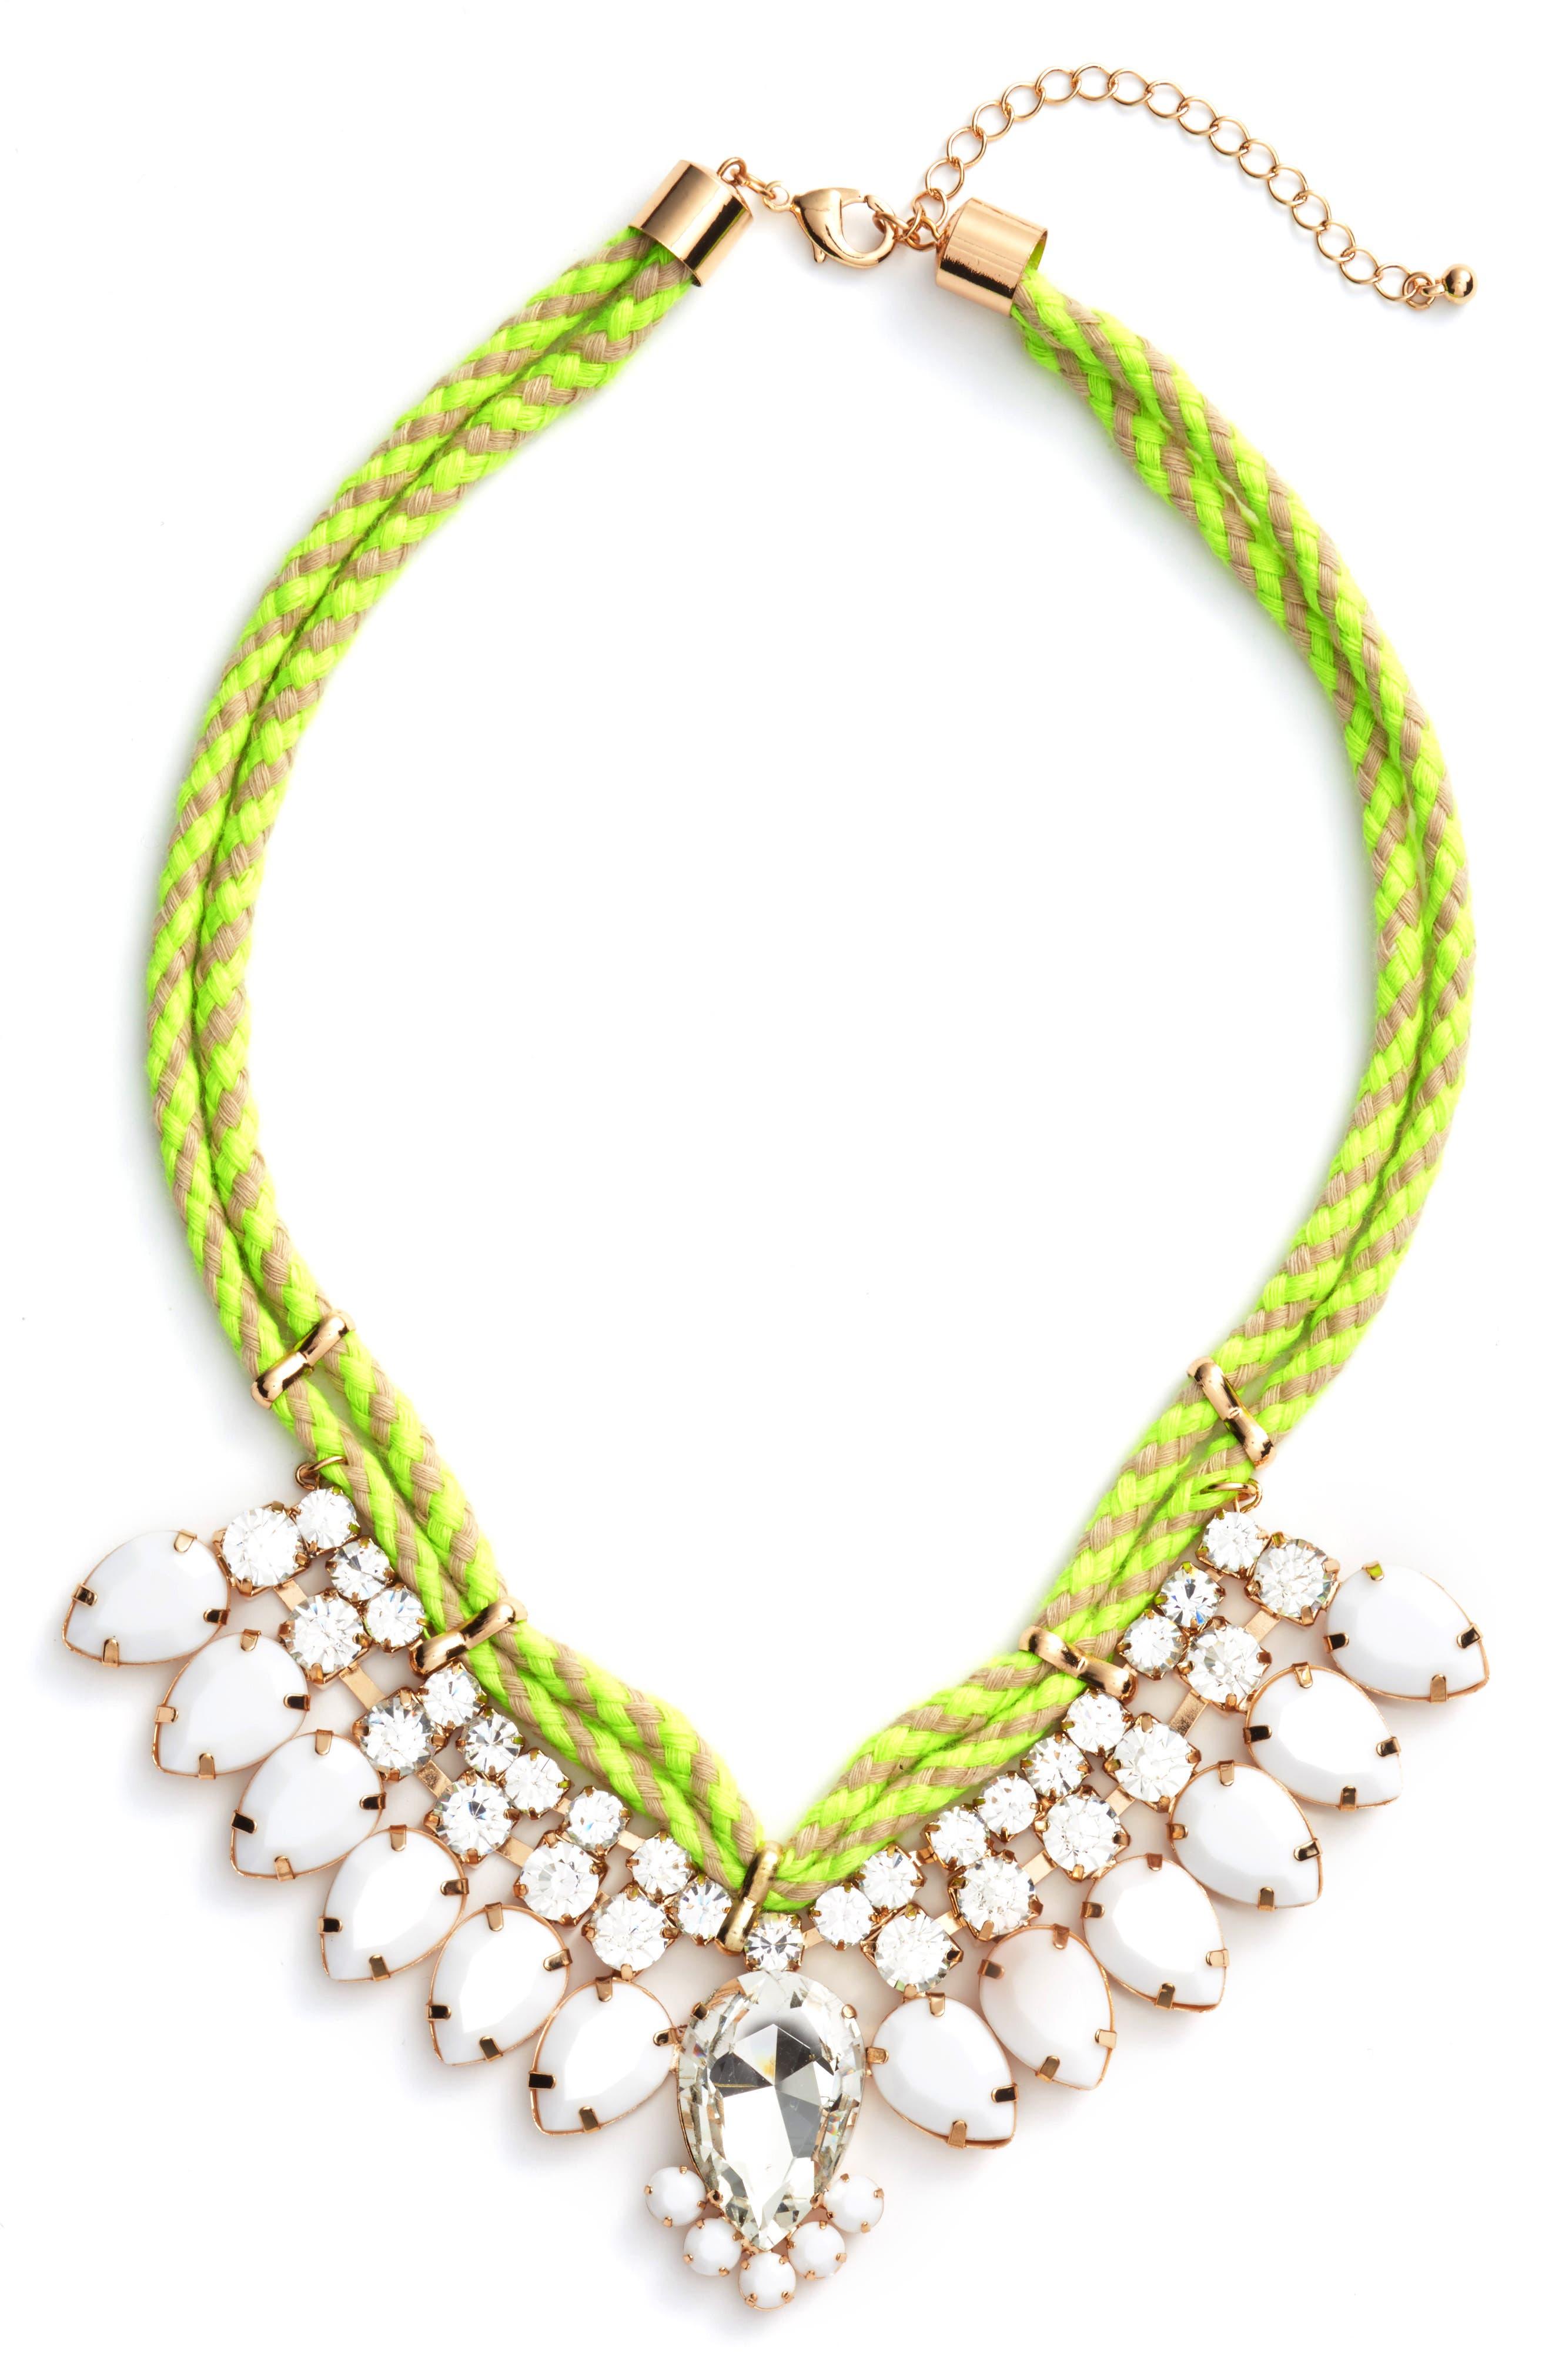 Alternate Image 1 Selected - Adia Kibur Teardrop Rope Necklace